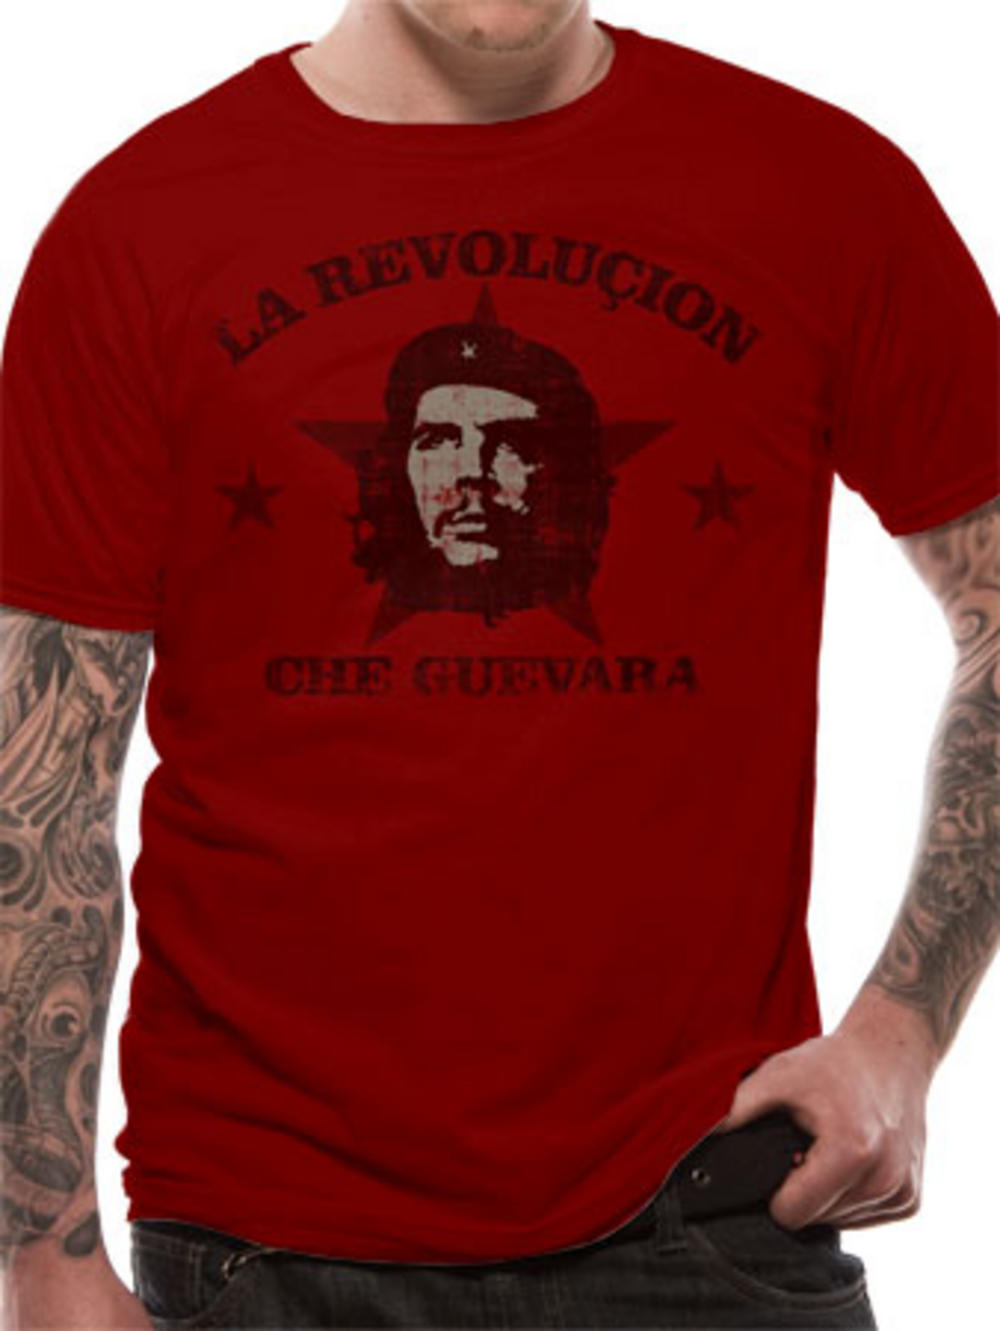 Che guevara revolution t shirt tm shop for Che guevara t shirt